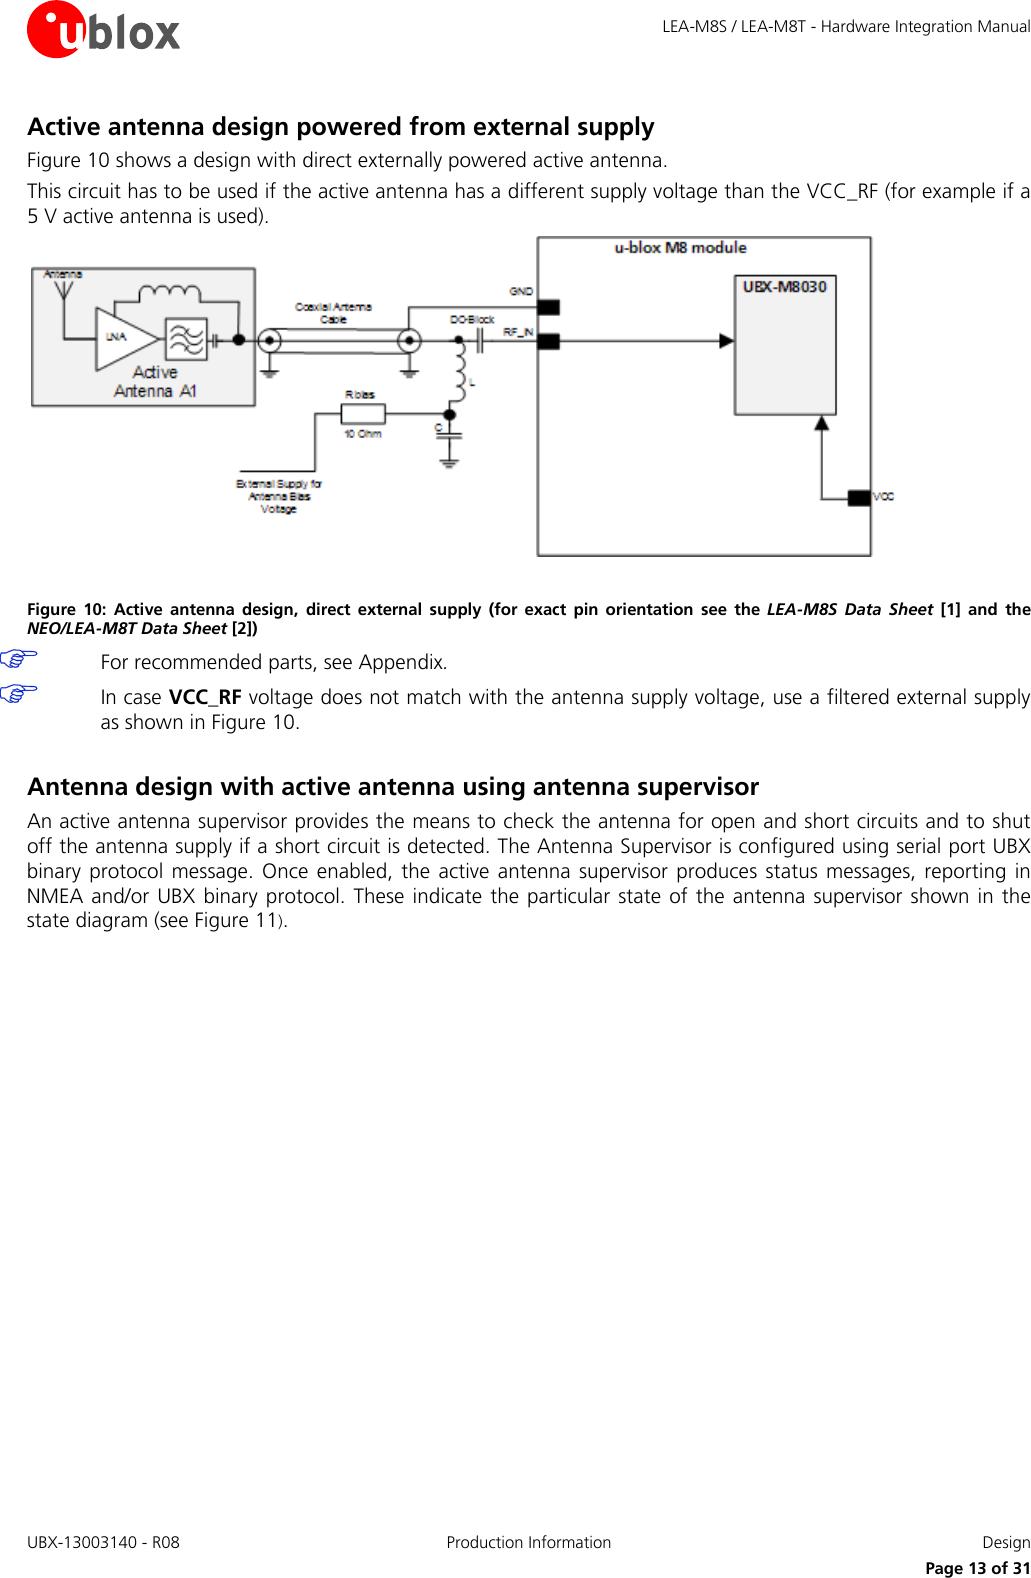 LEA M8S / M8T Hardware Integration Manual (UBX 13003140)